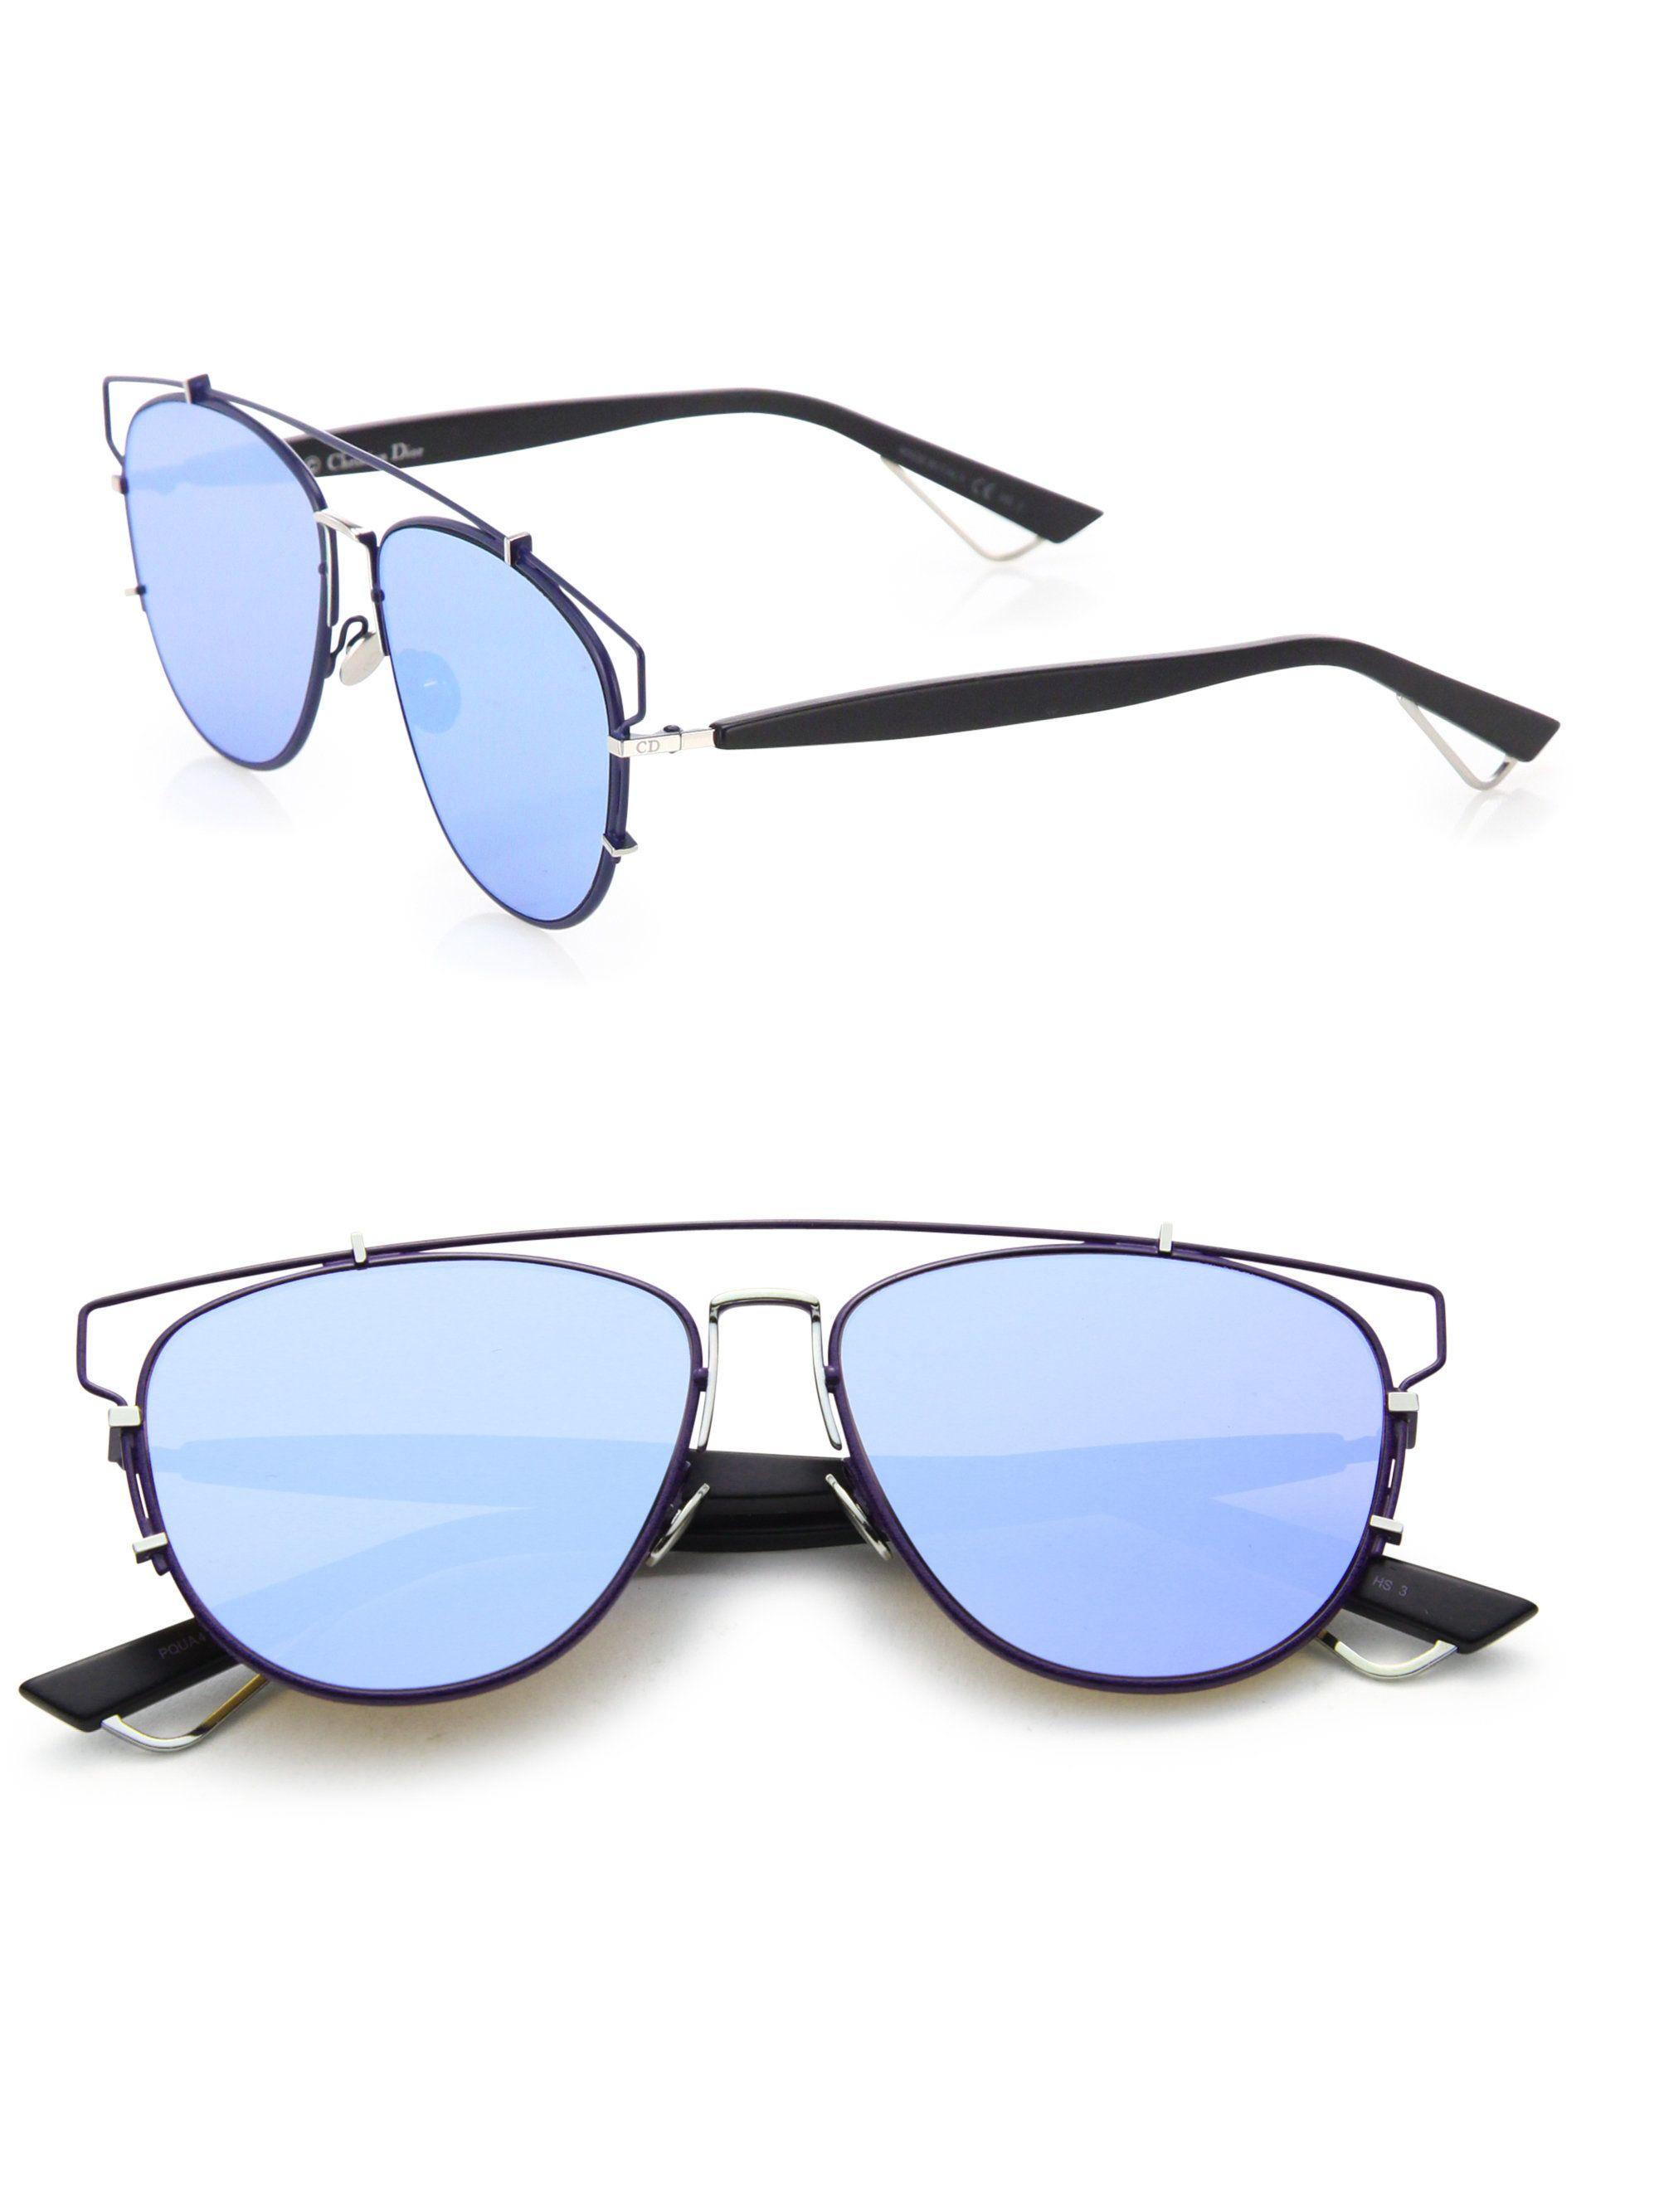 89763a8eacd2 Dior Men Sunglasses